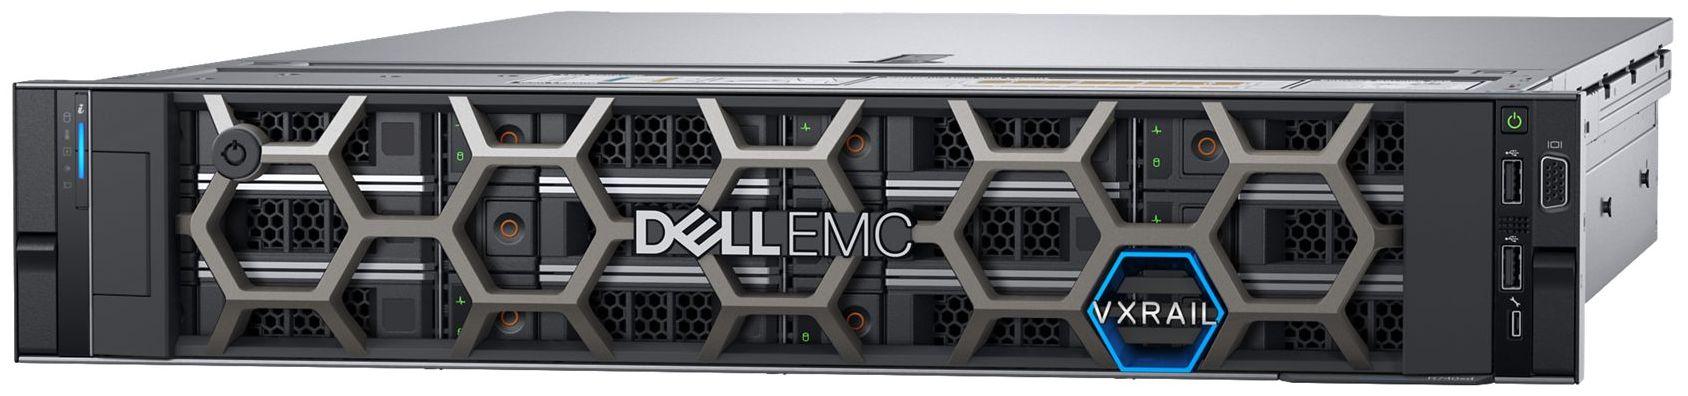 Dell EMC VxRail S-Series